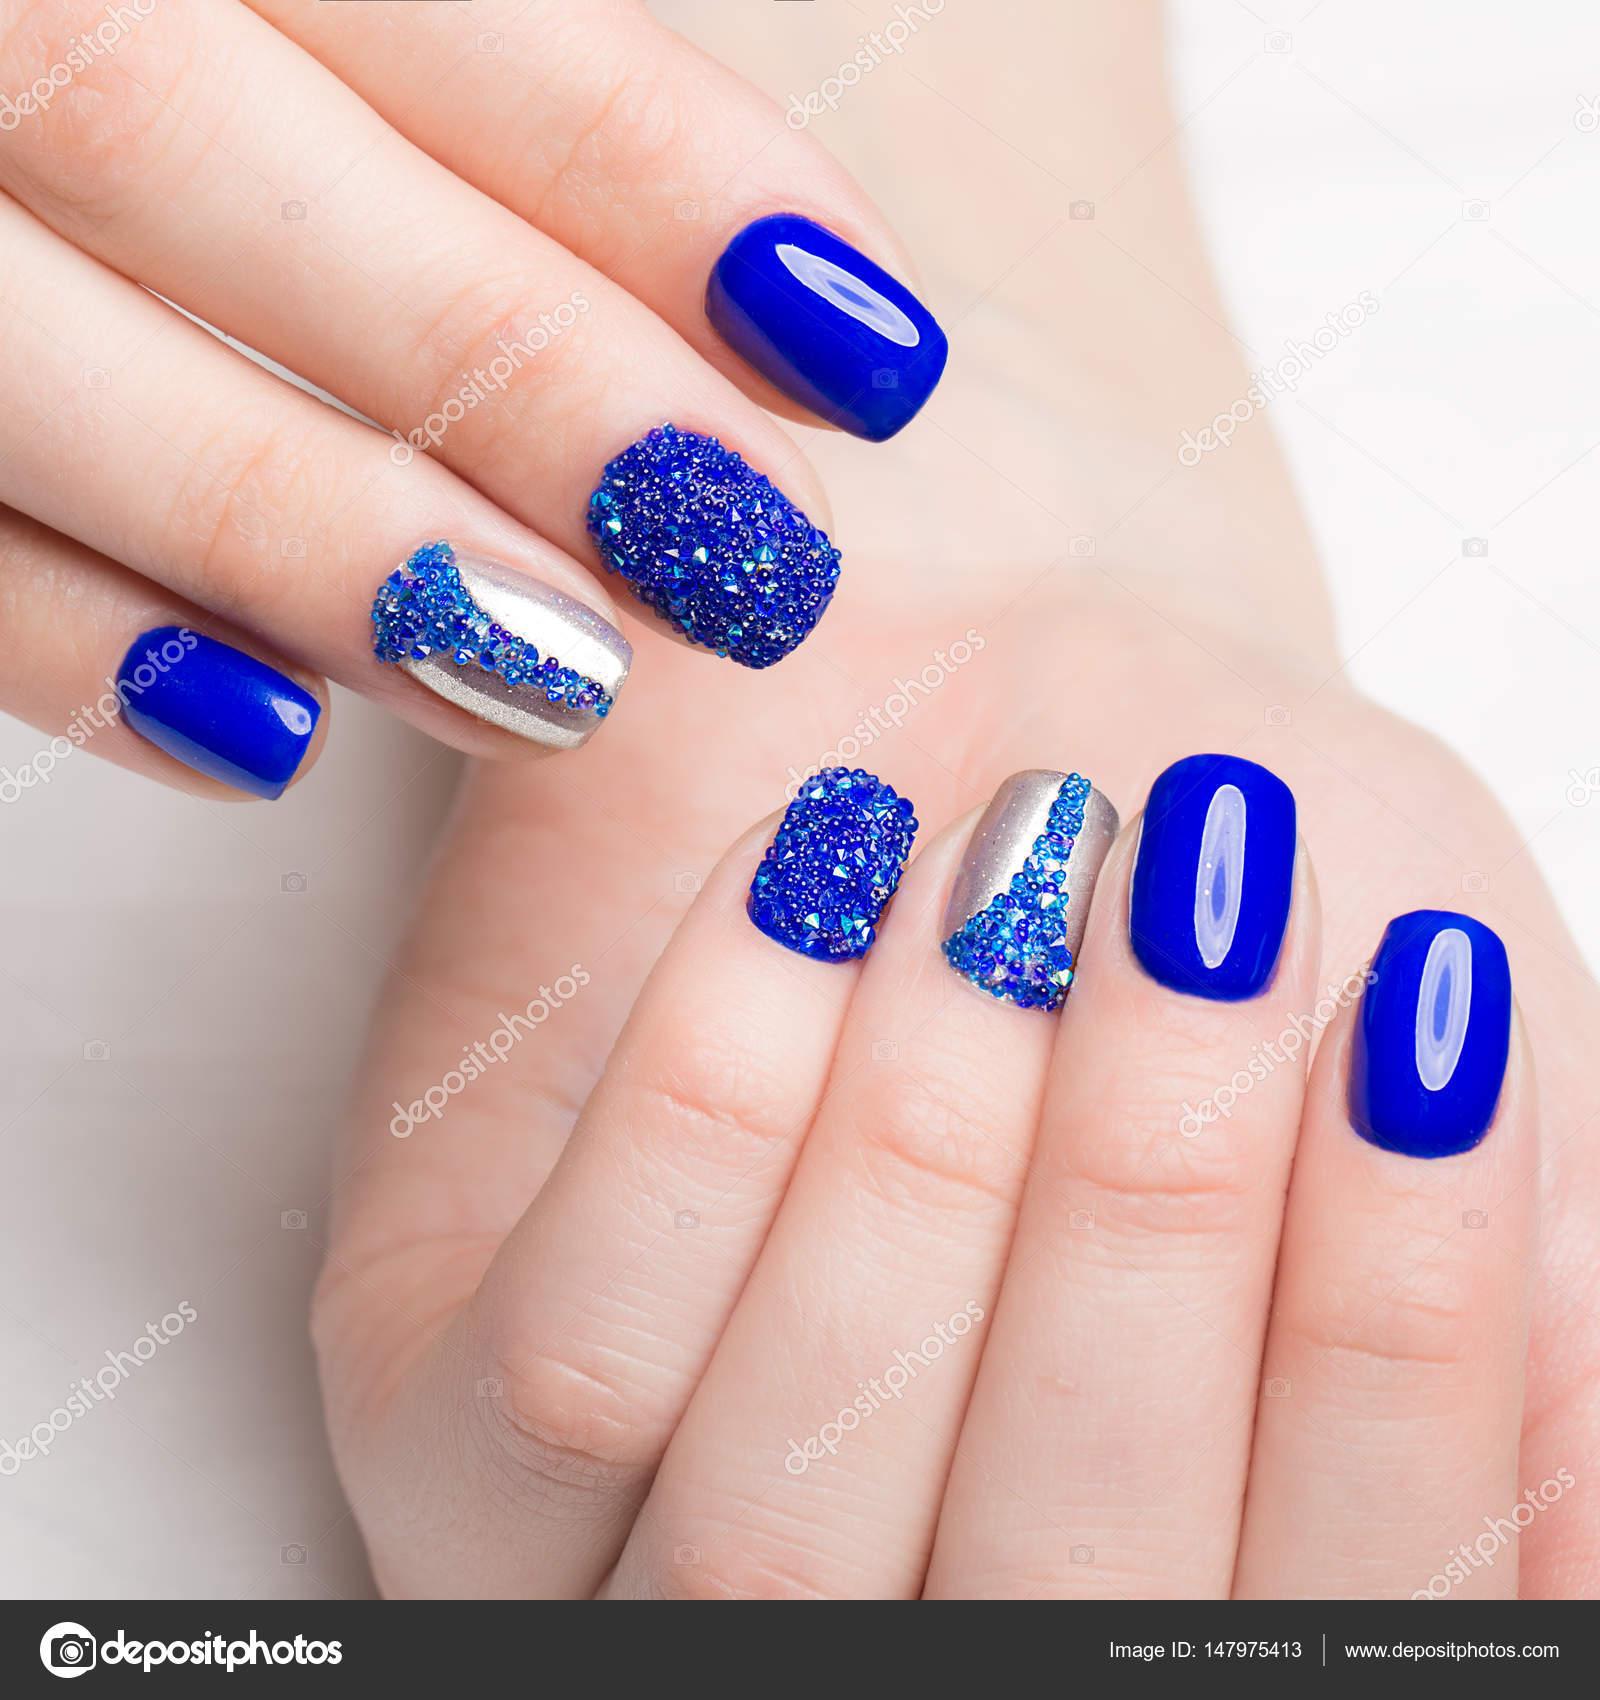 Beautifil Blauwe Manicure Met Strass Nail Design Close Up